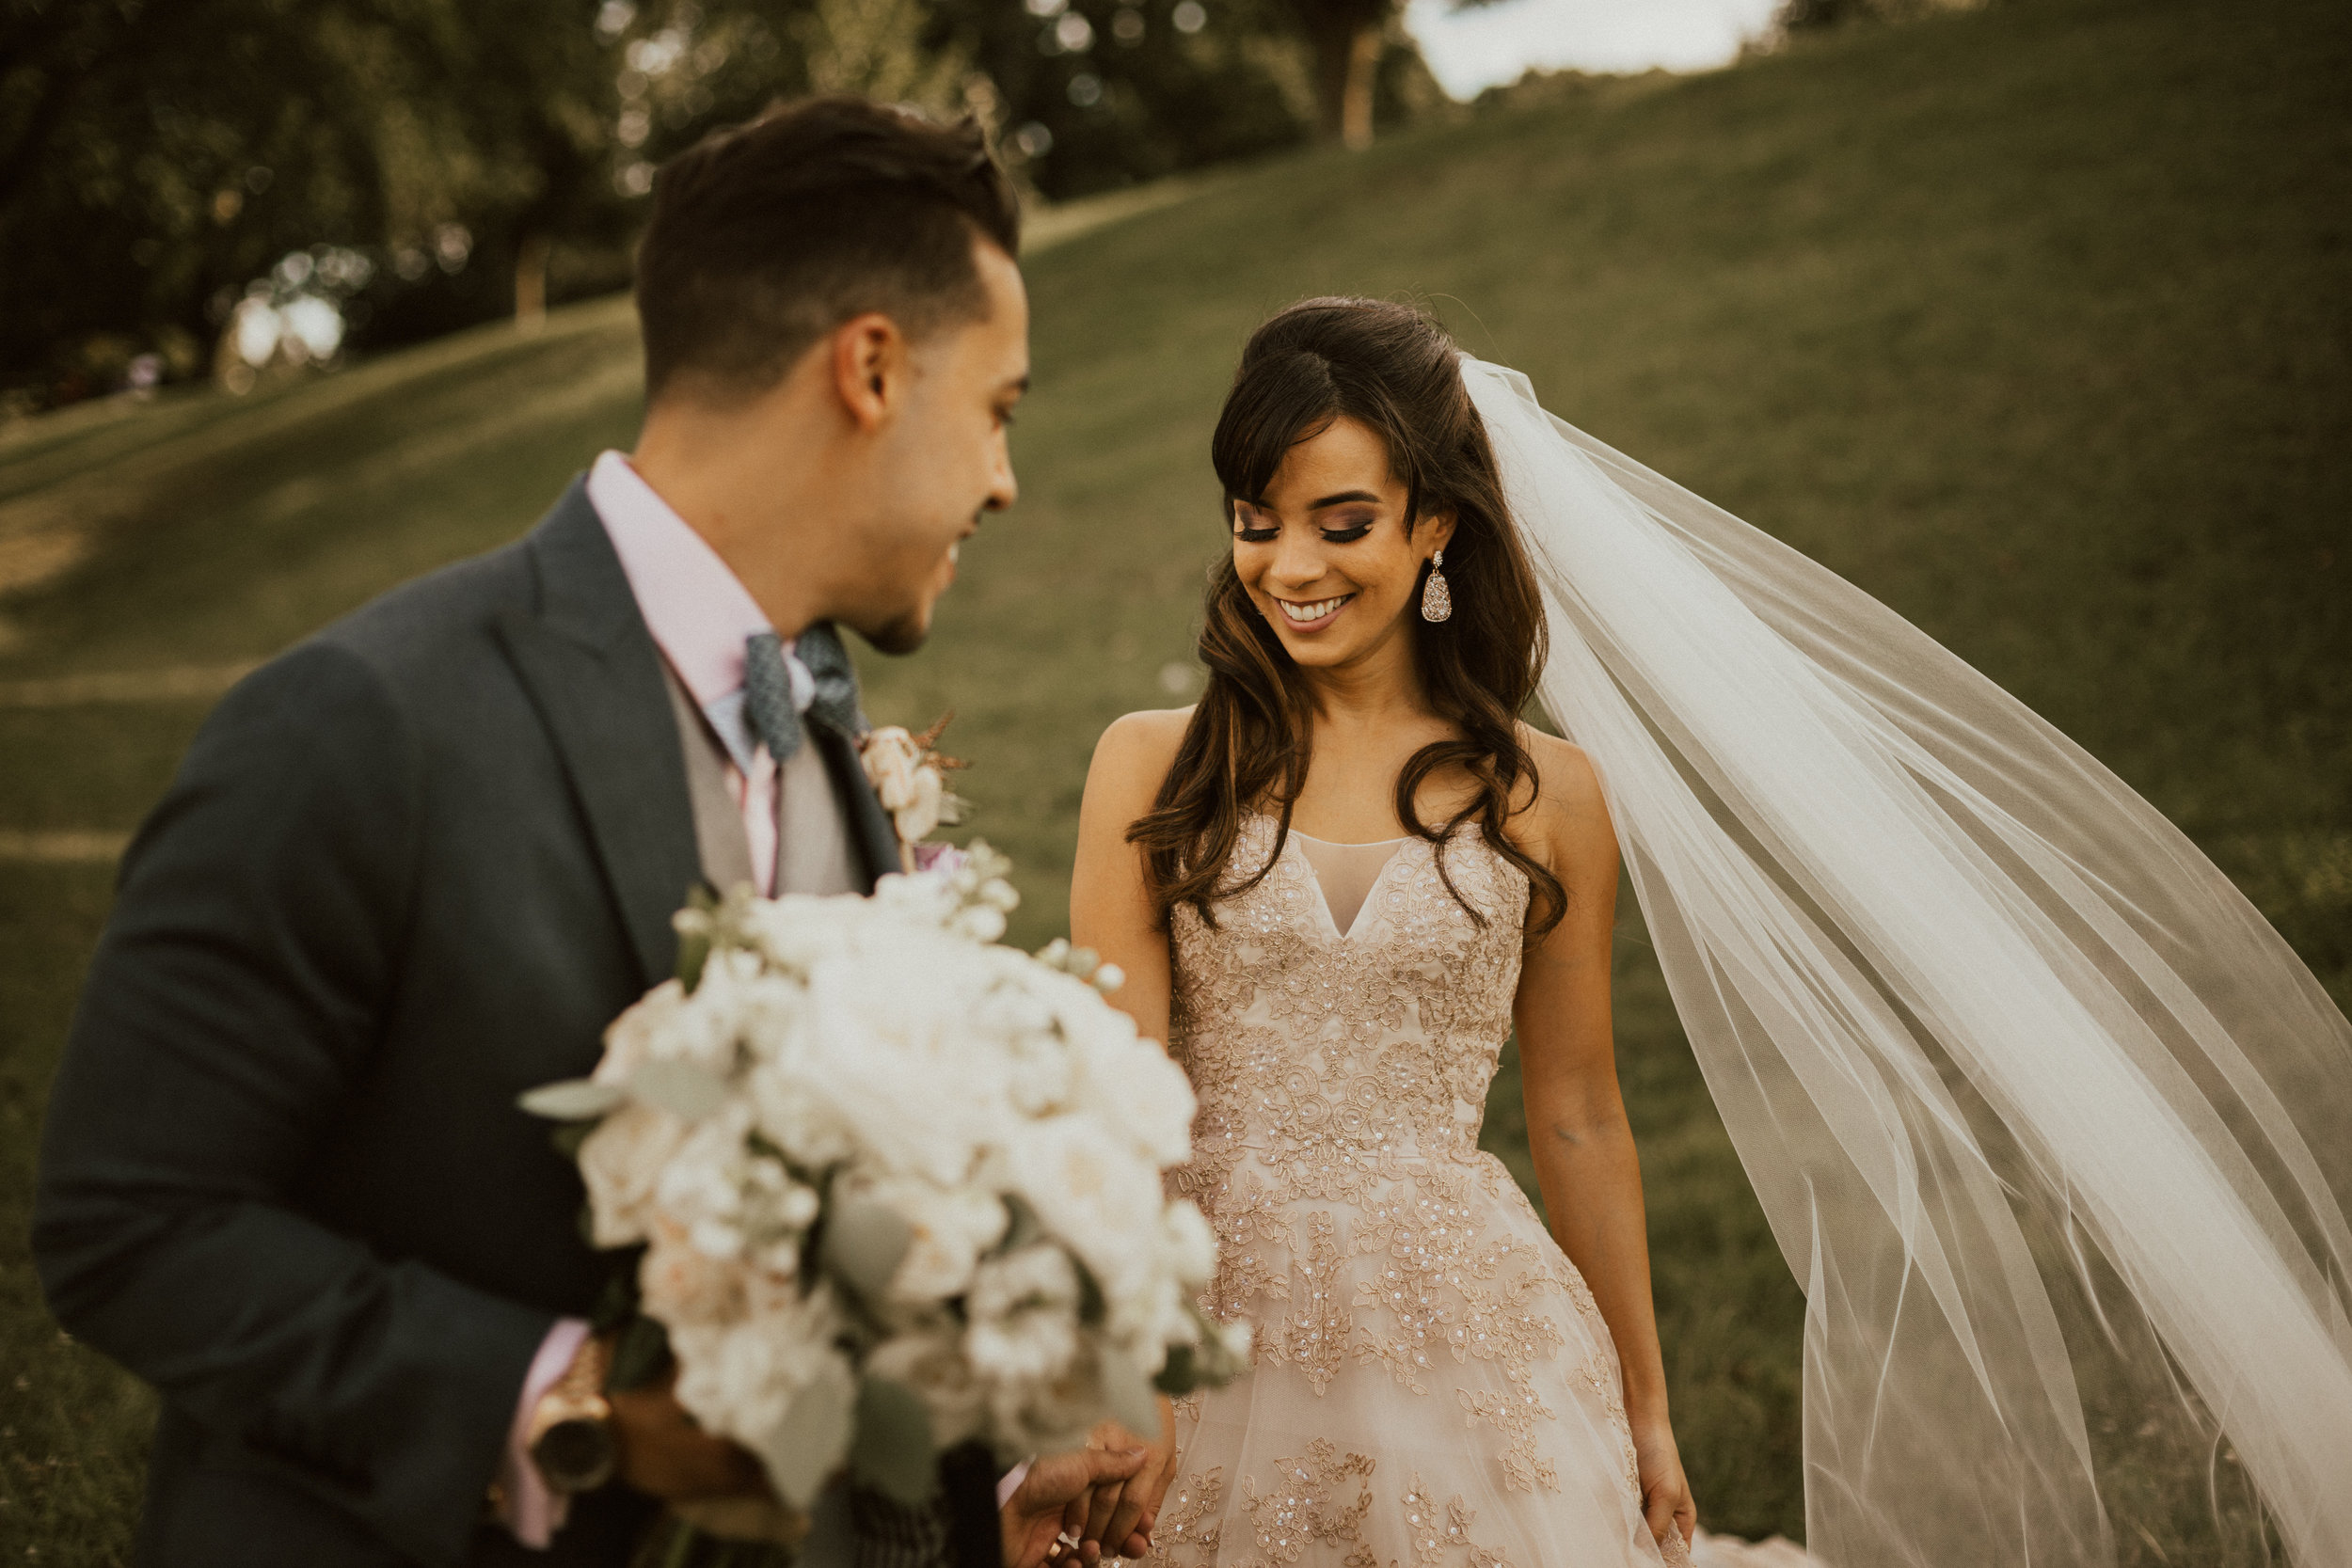 Nashville Wedding Photography by Saul Cervantes Photography-104.jpg